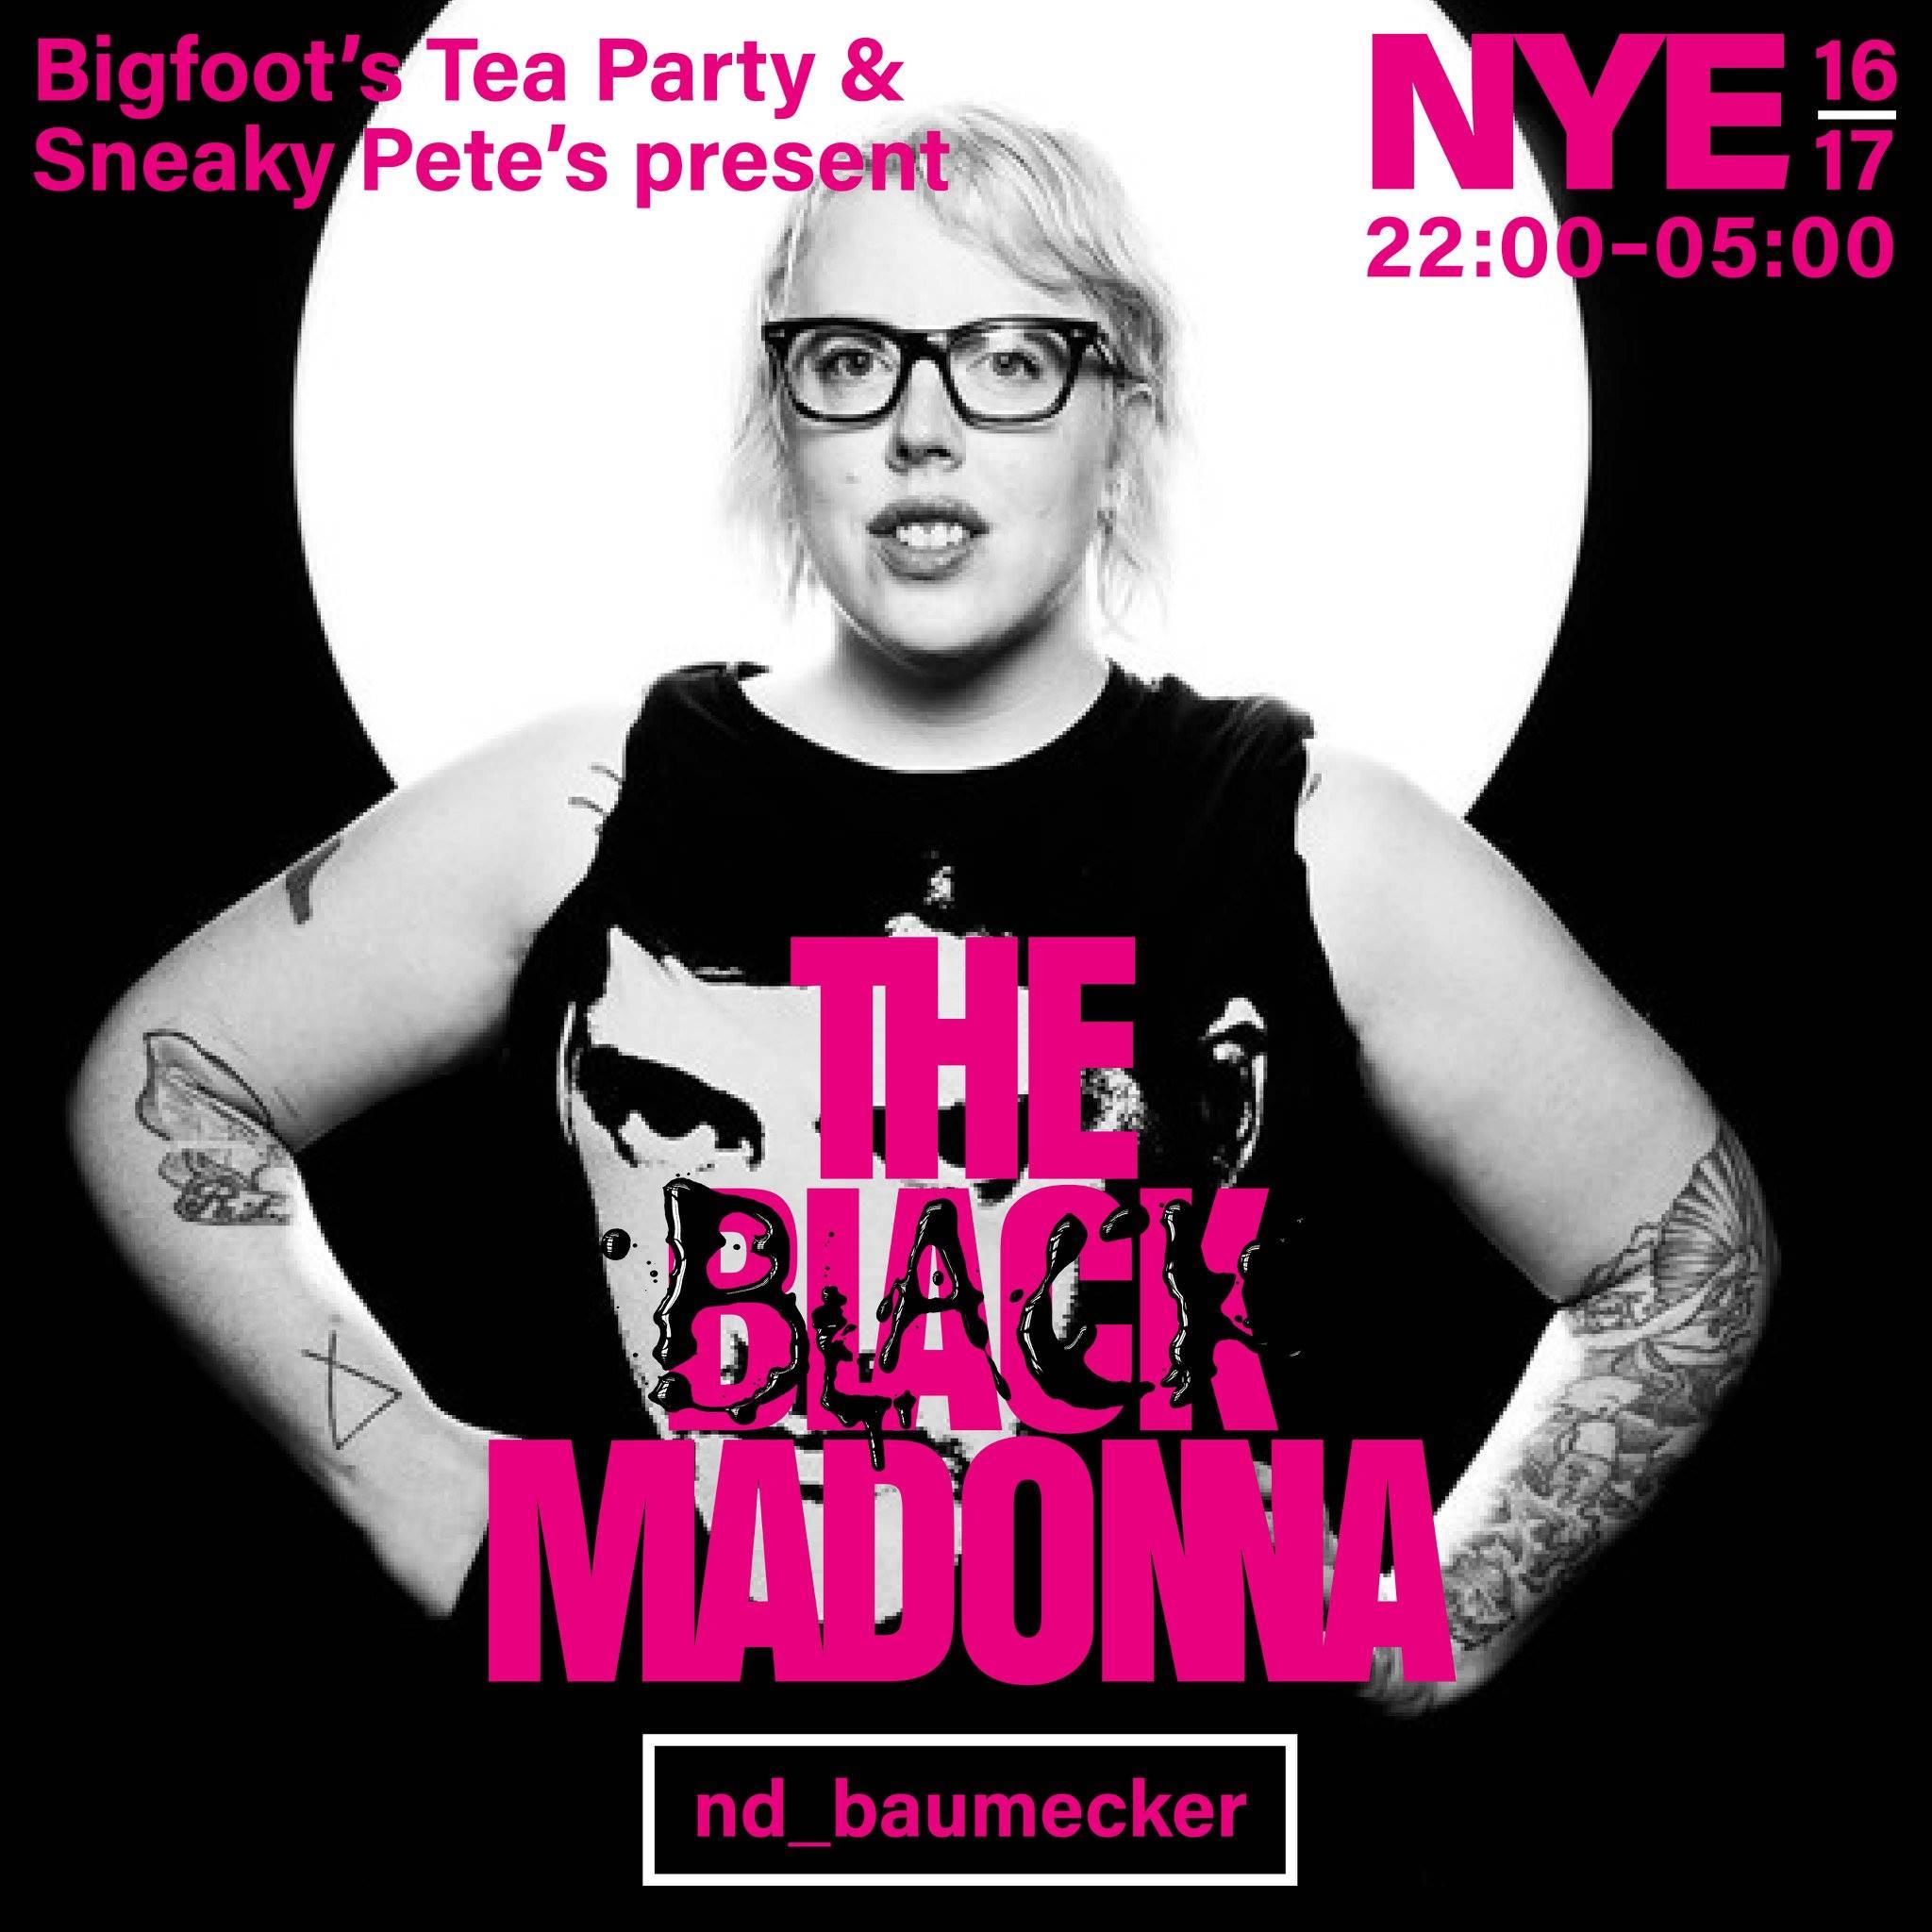 the-black-madonna-presse22